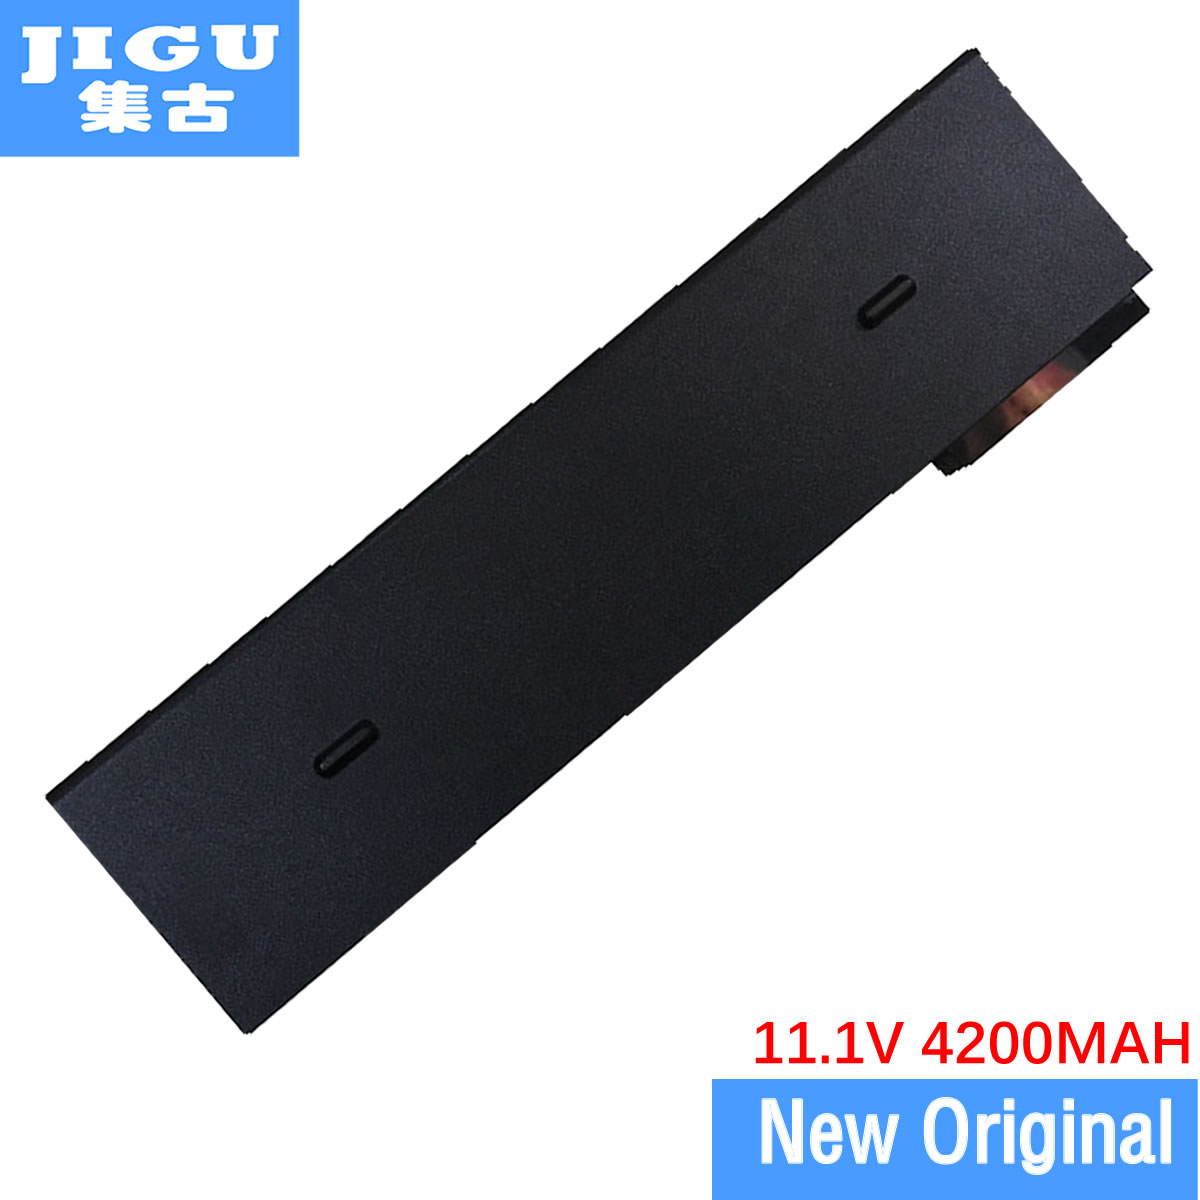 JIGU Original HSTNN W90C HSTNN YB3L HSTNN YB3M MI04 MI06 H4A44AA HSTNN OB3L Laptop Battery for